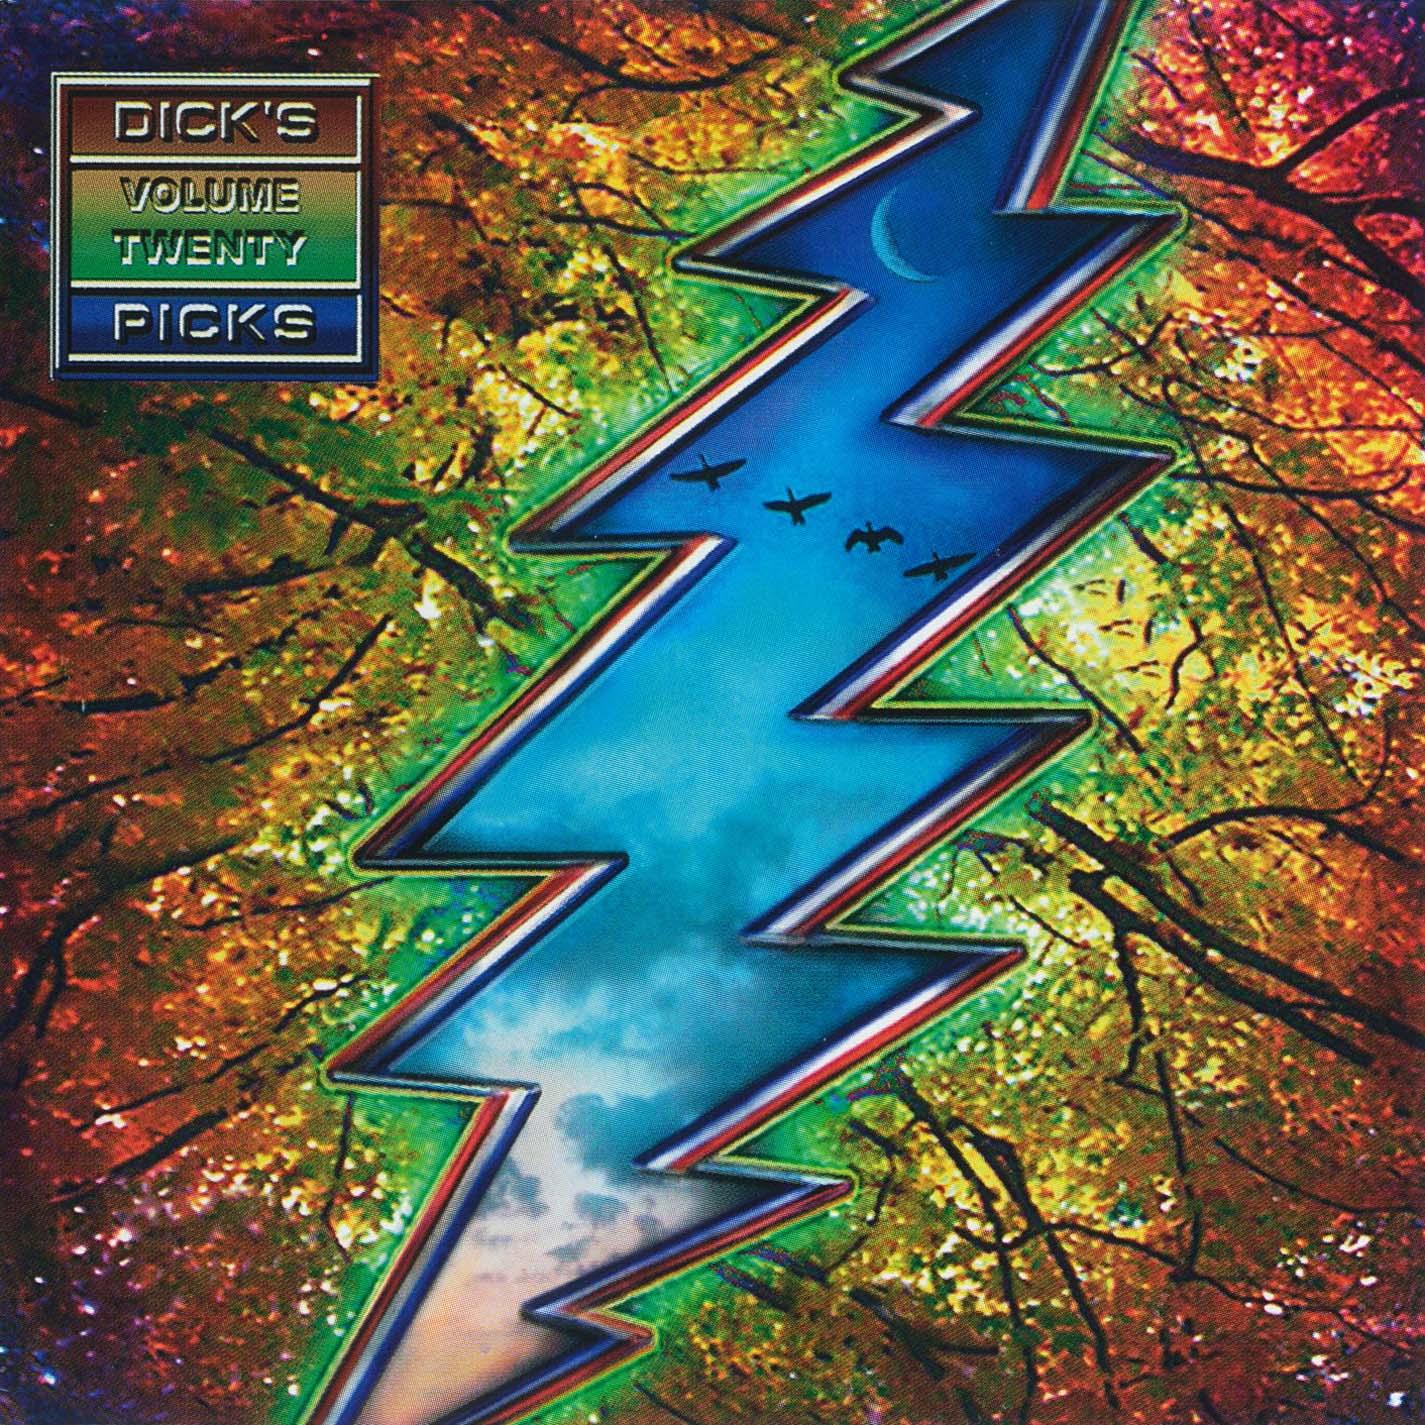 Grateful Dead Dick's Picks 20 album cover artwork